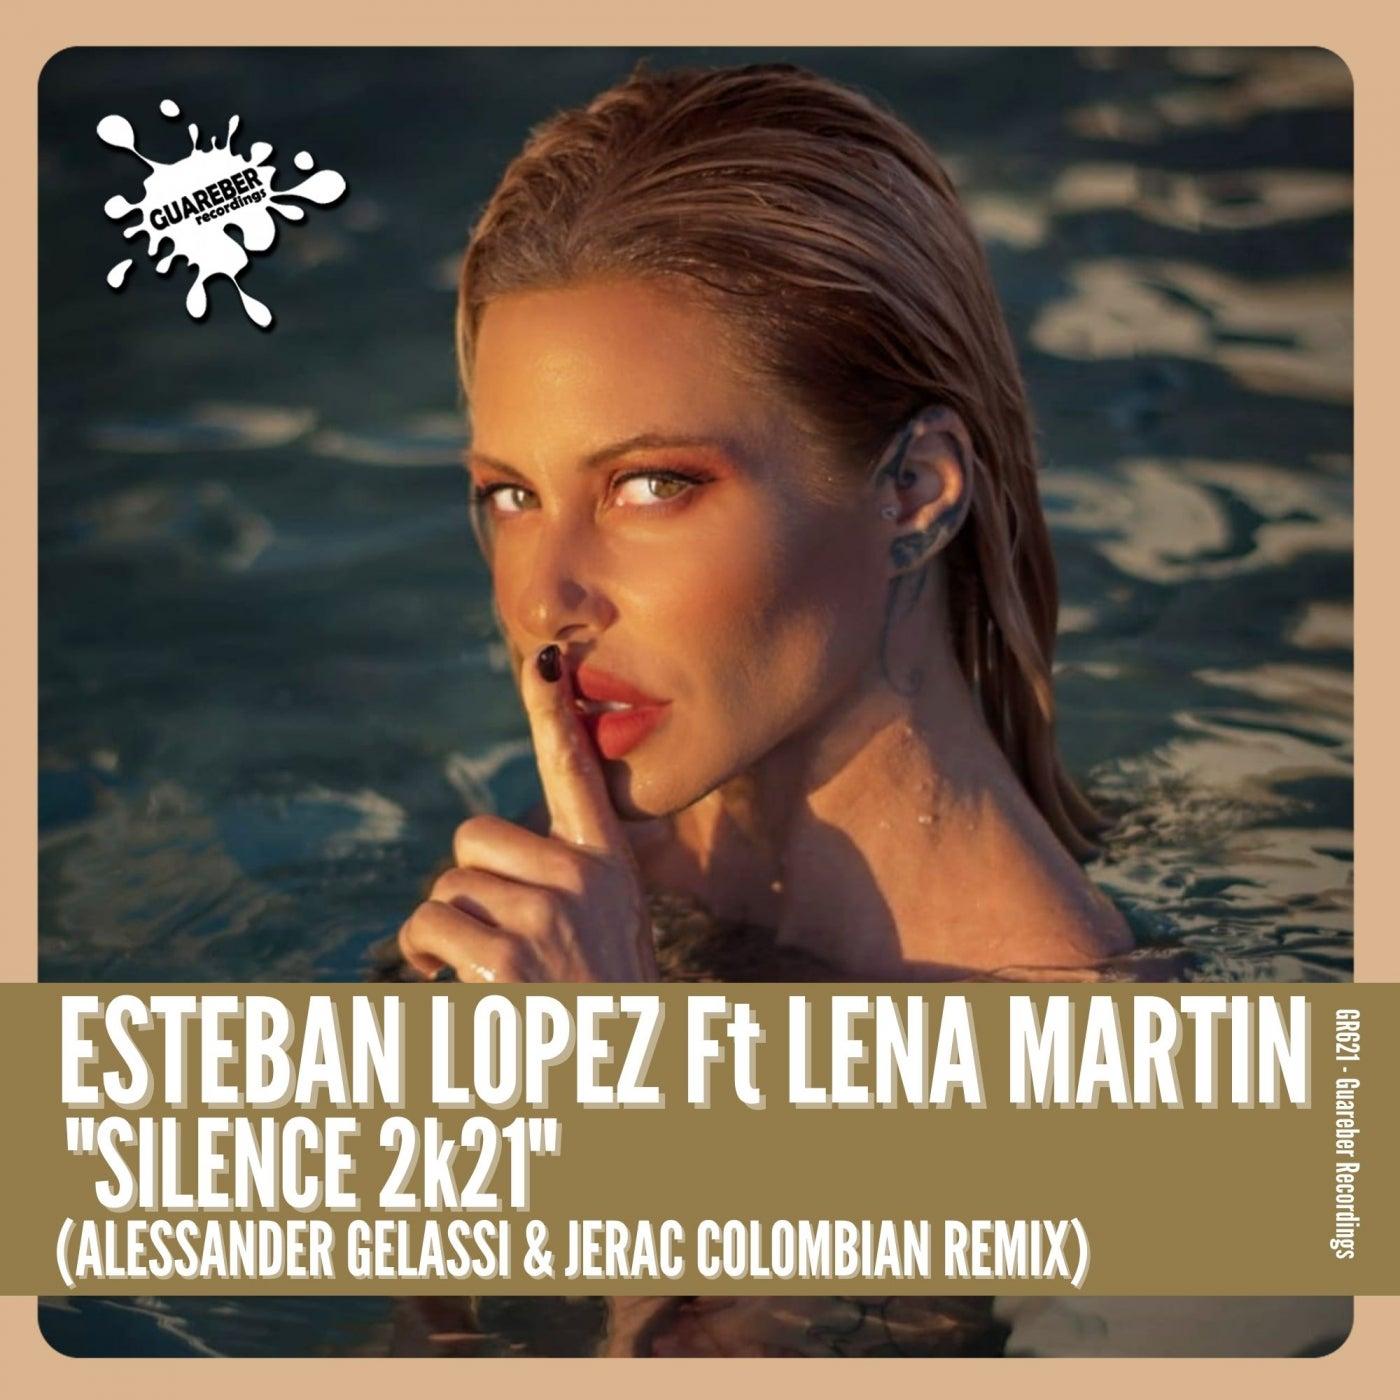 Silence 2k21 (Alessander Gelassi & Jerac Colombian Remix)